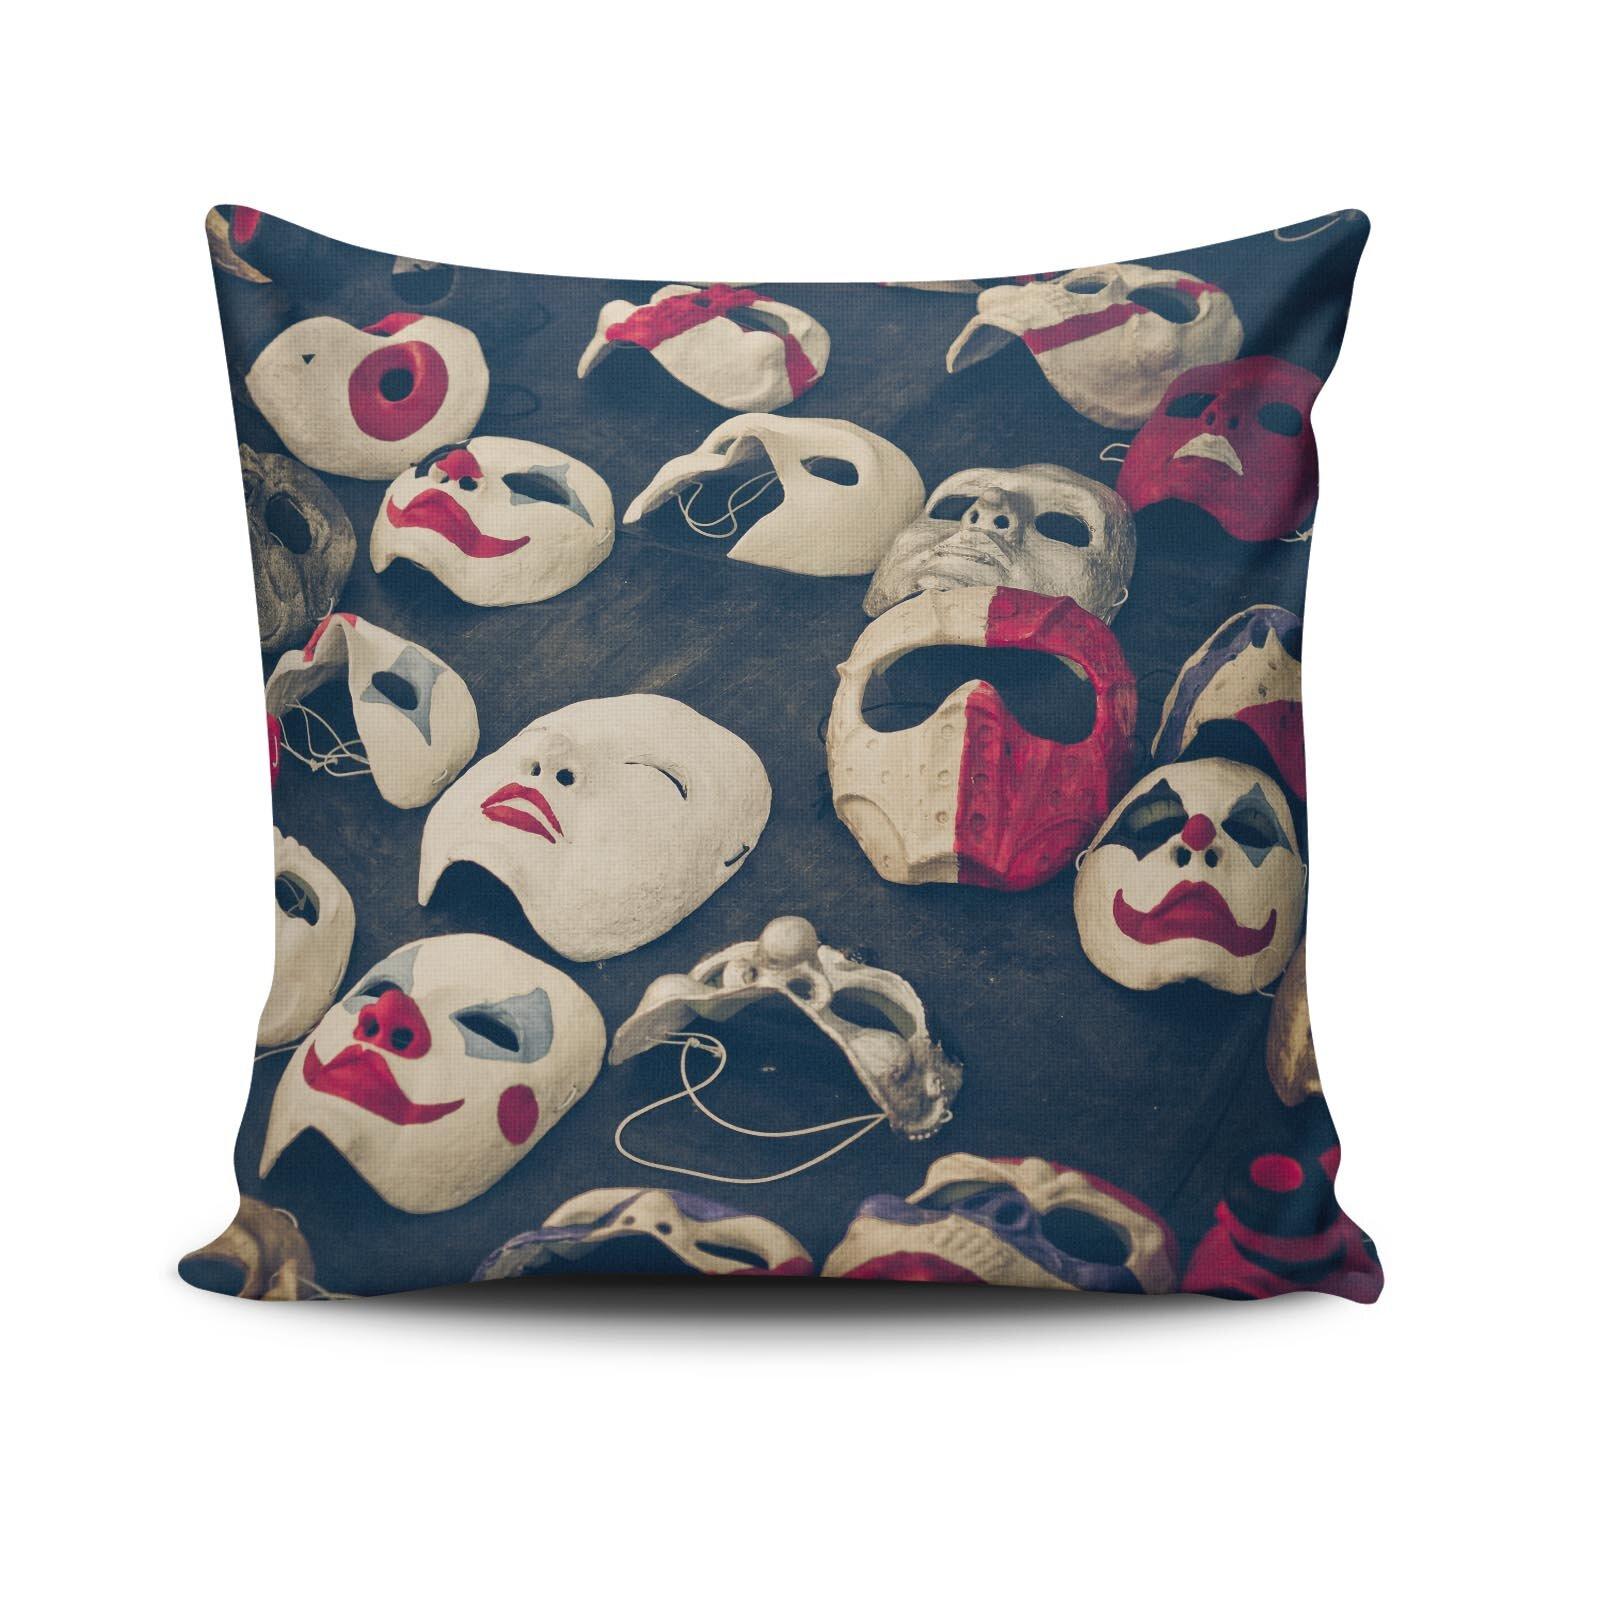 Perna decorativa Cushion Love, Dimensiune: 45 x 45 cm, Material exterior: 50% bumbac / 50% poliester 768CLV0179